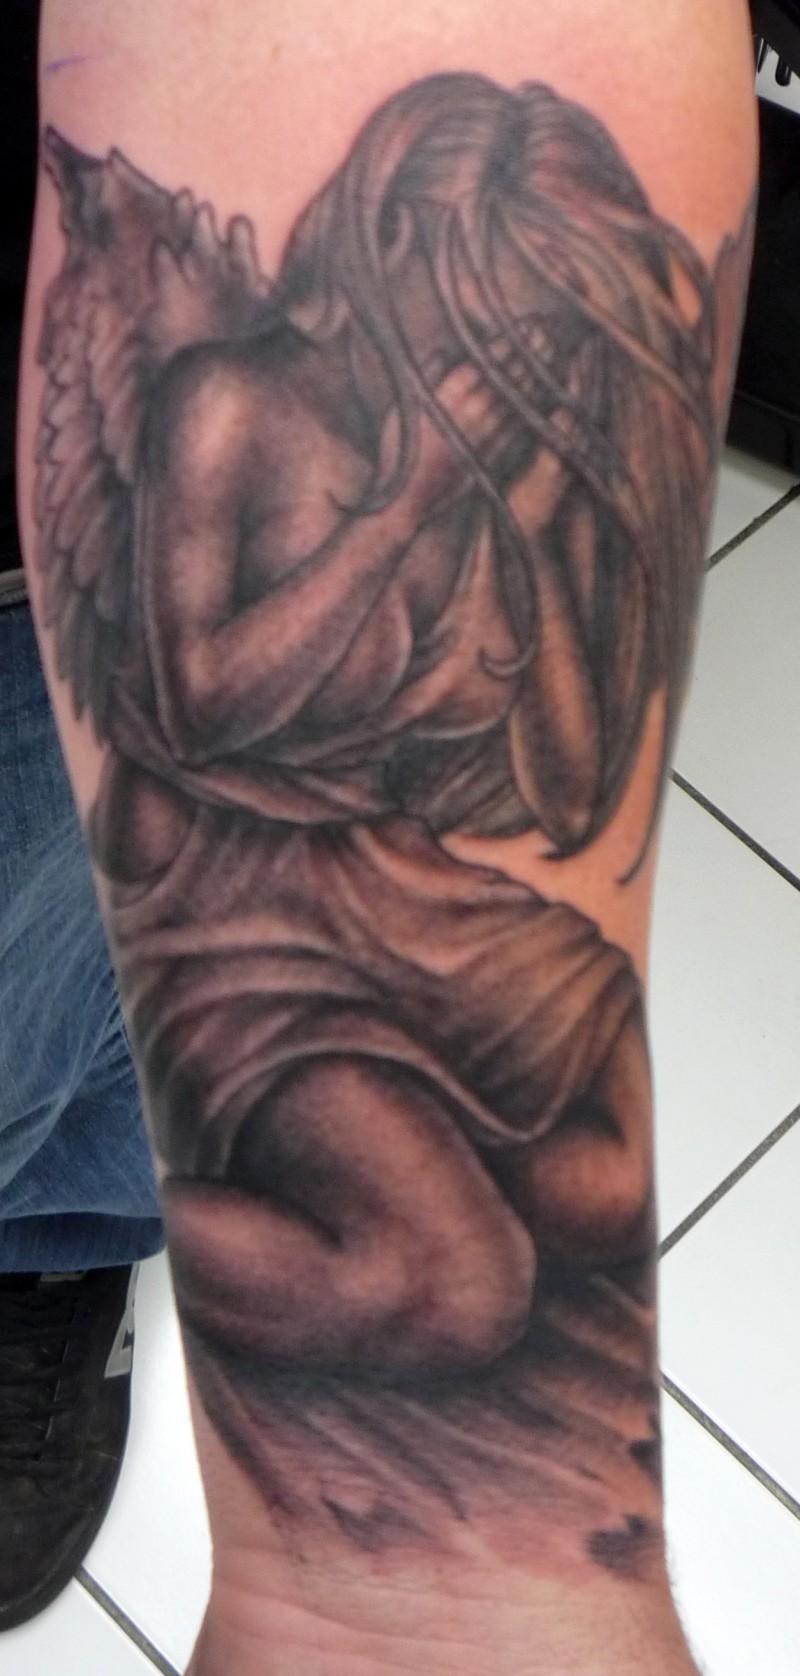 Crying girl angel tattoo on hand